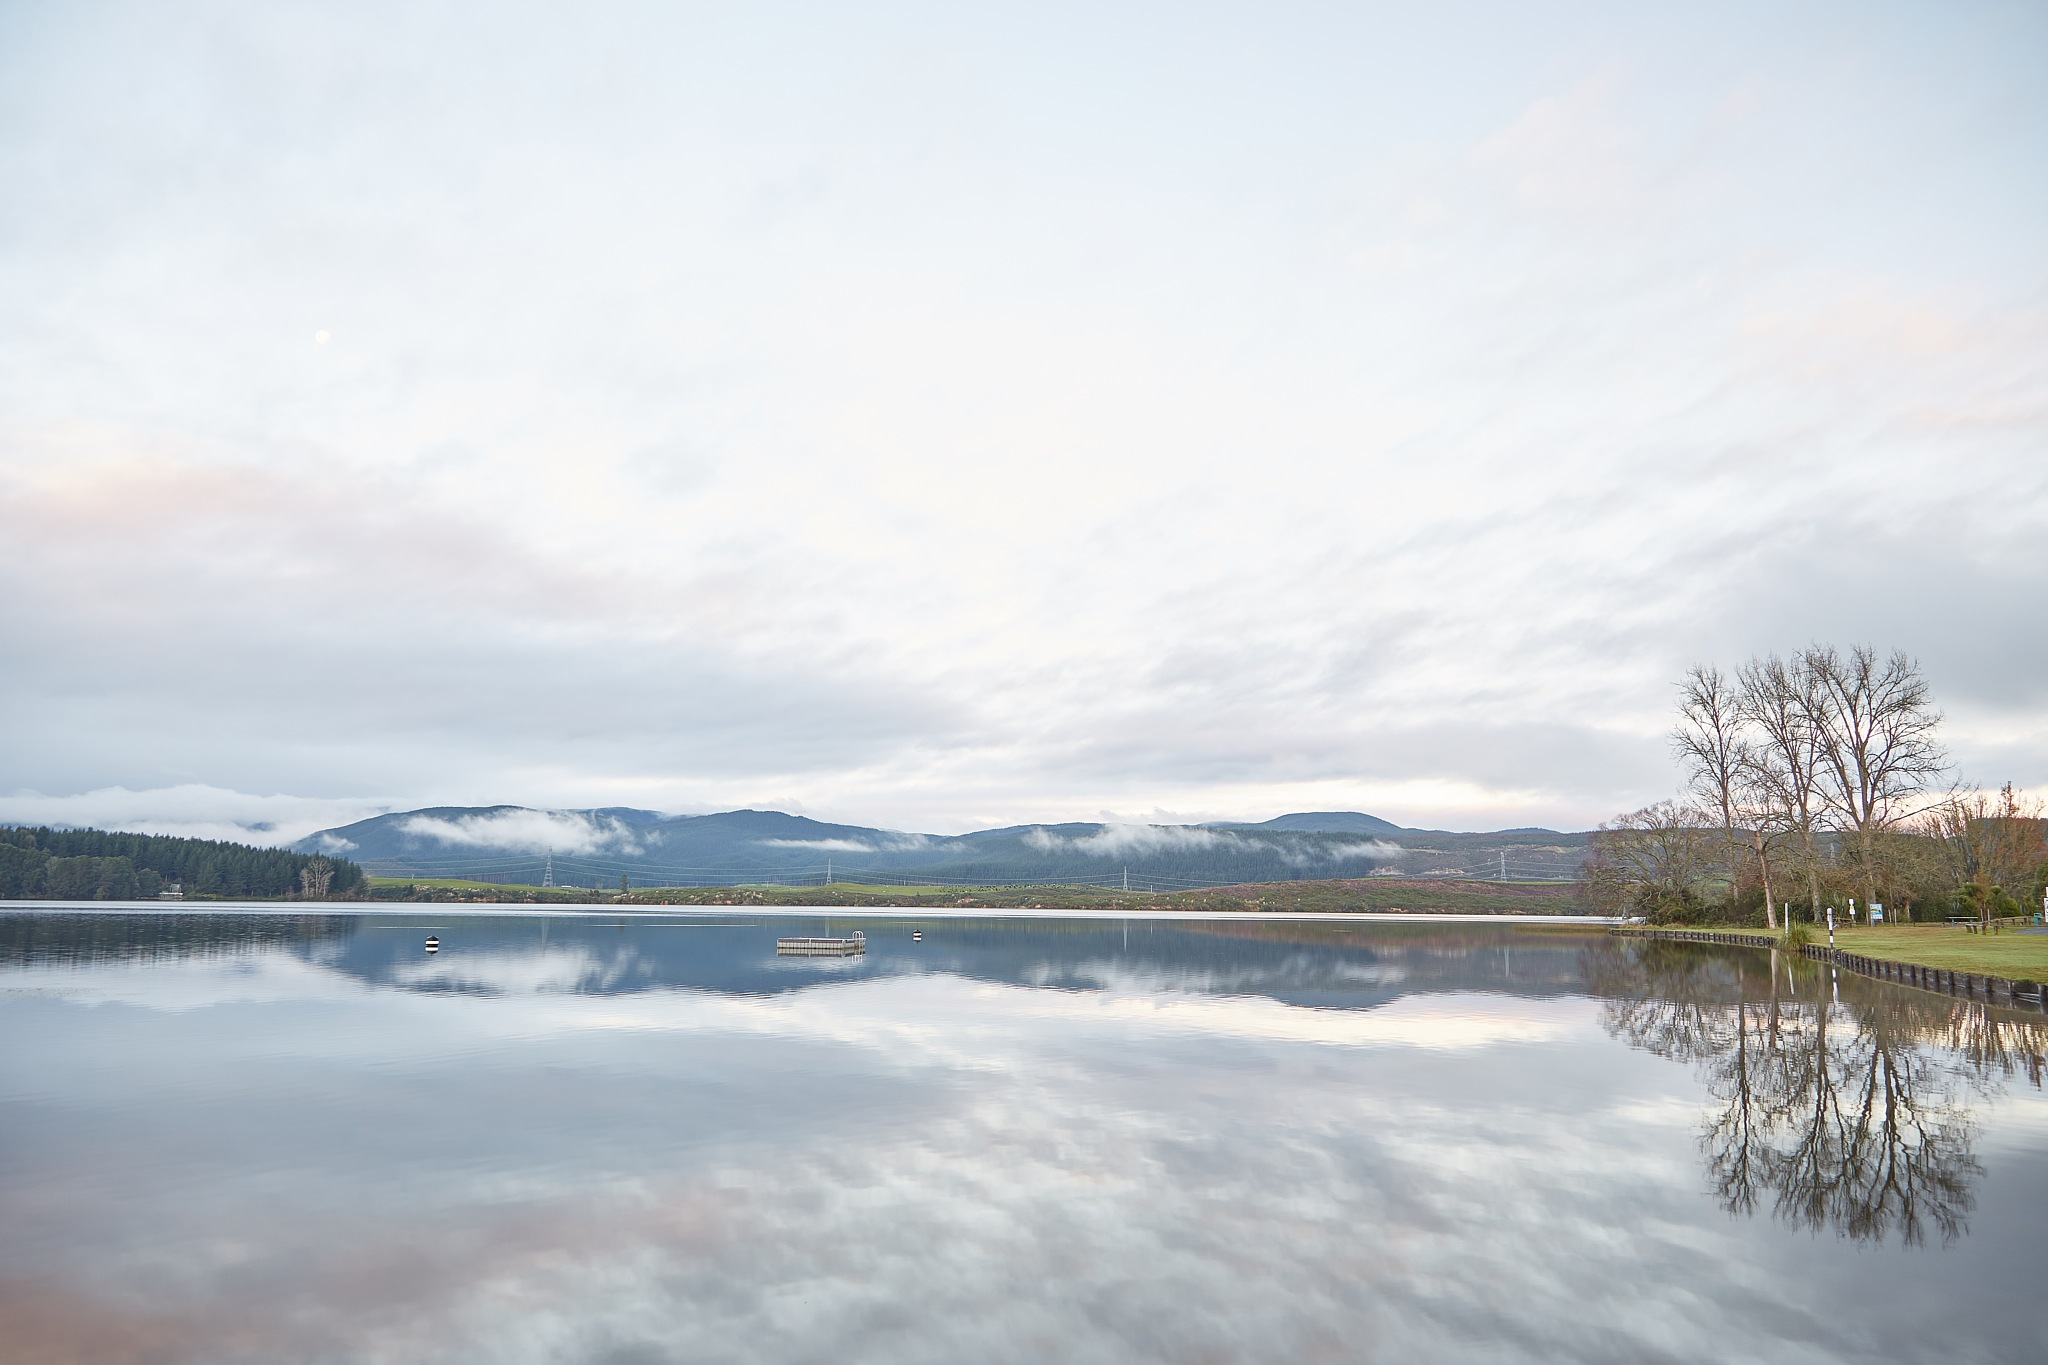 Calm lake by Adriel Kloppenburg